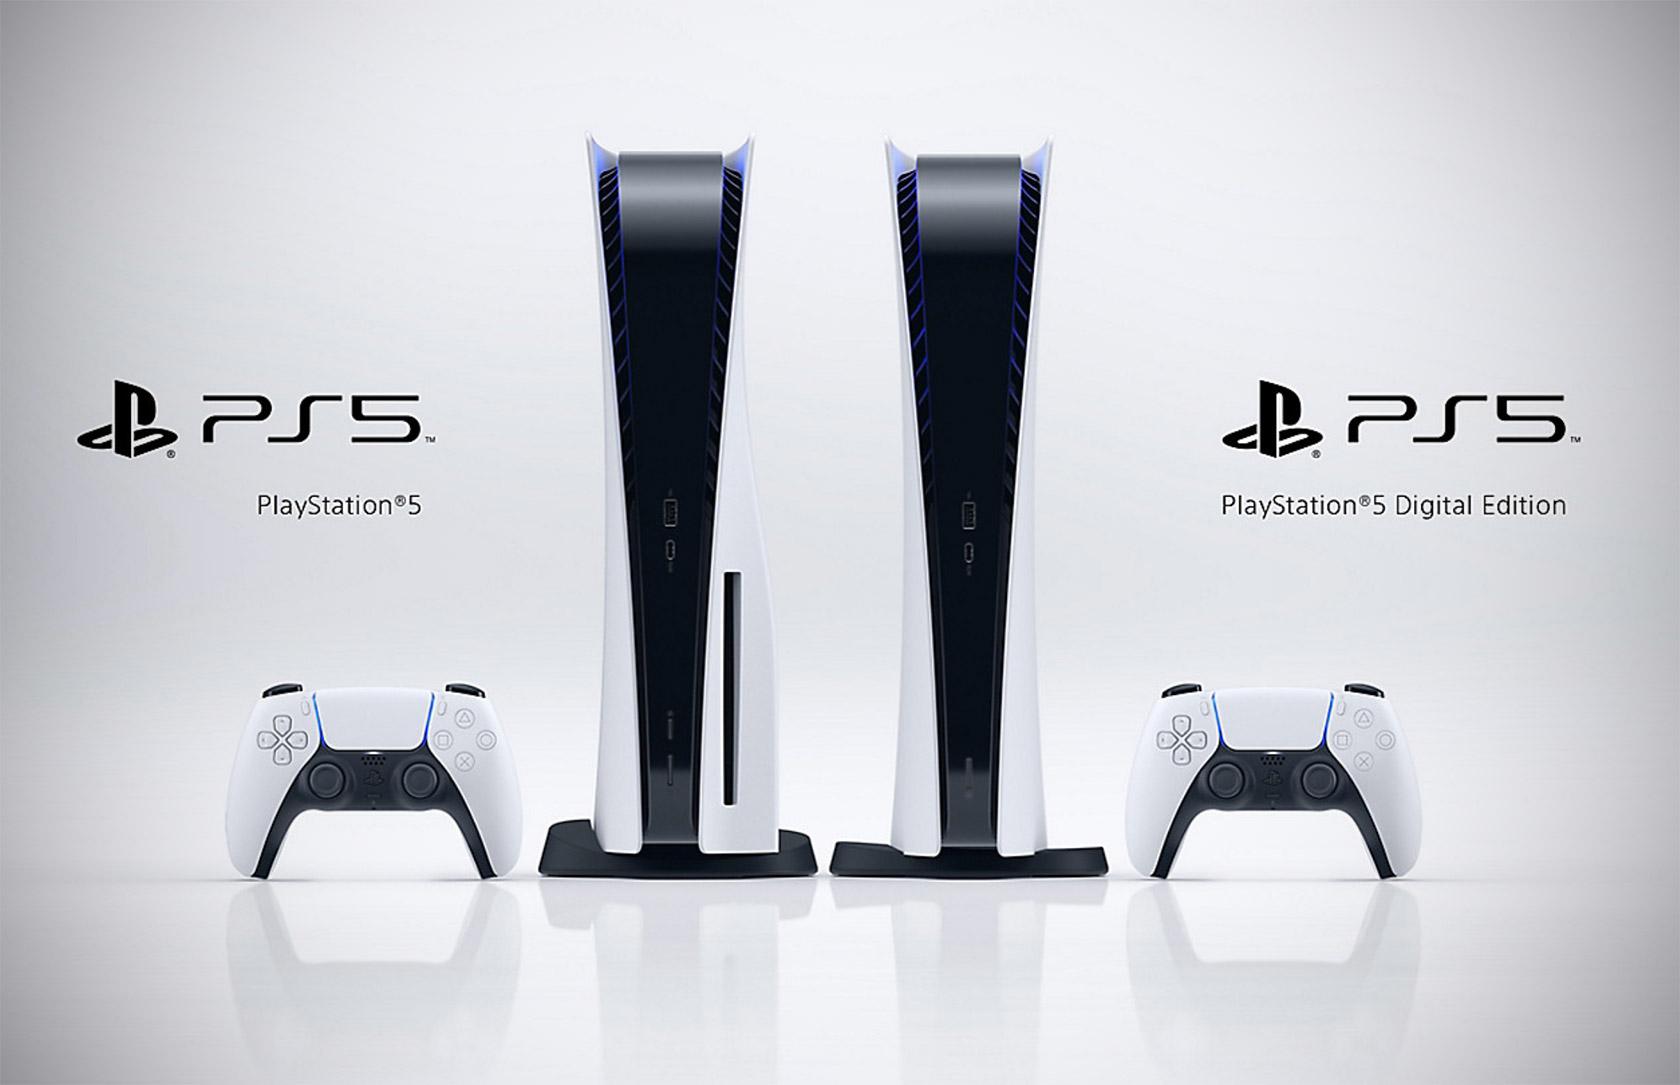 Sony PlayStation 5 Pre-Order